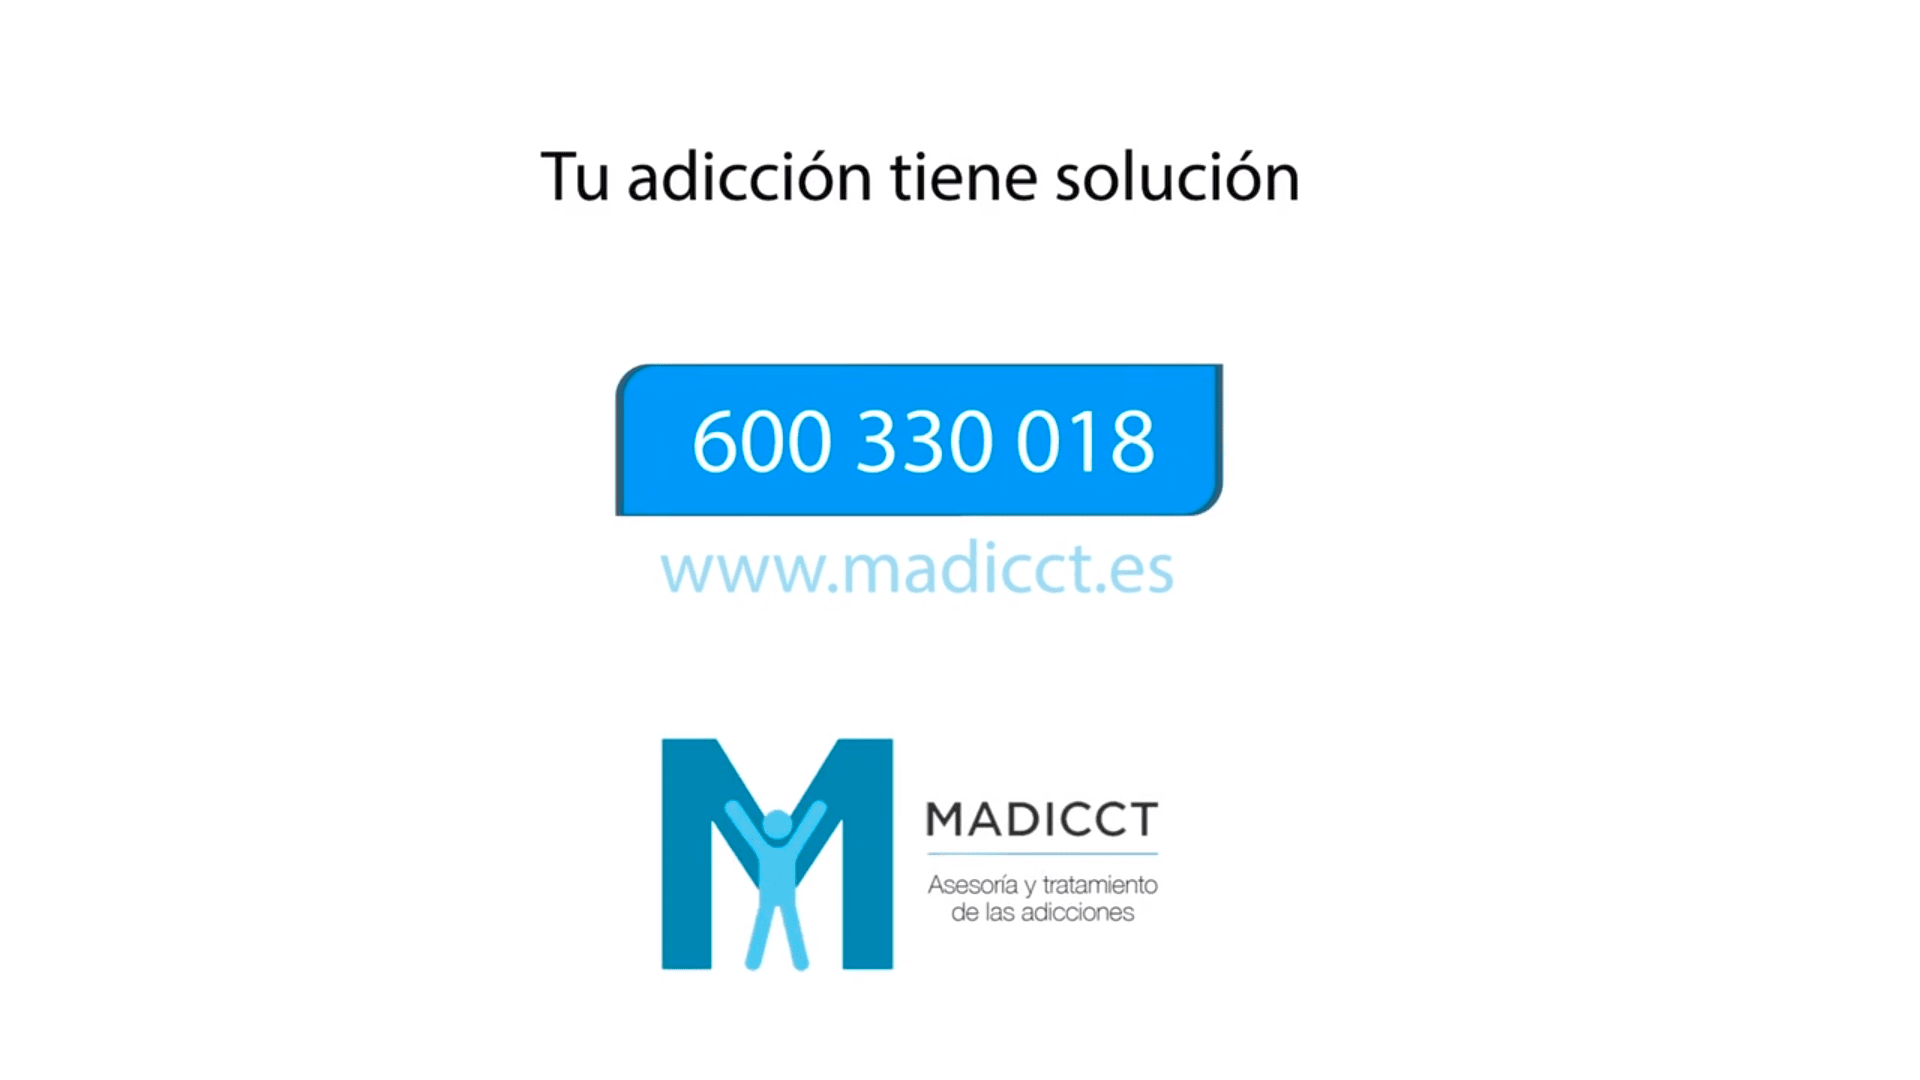 tratamiento de adicciones andalucia